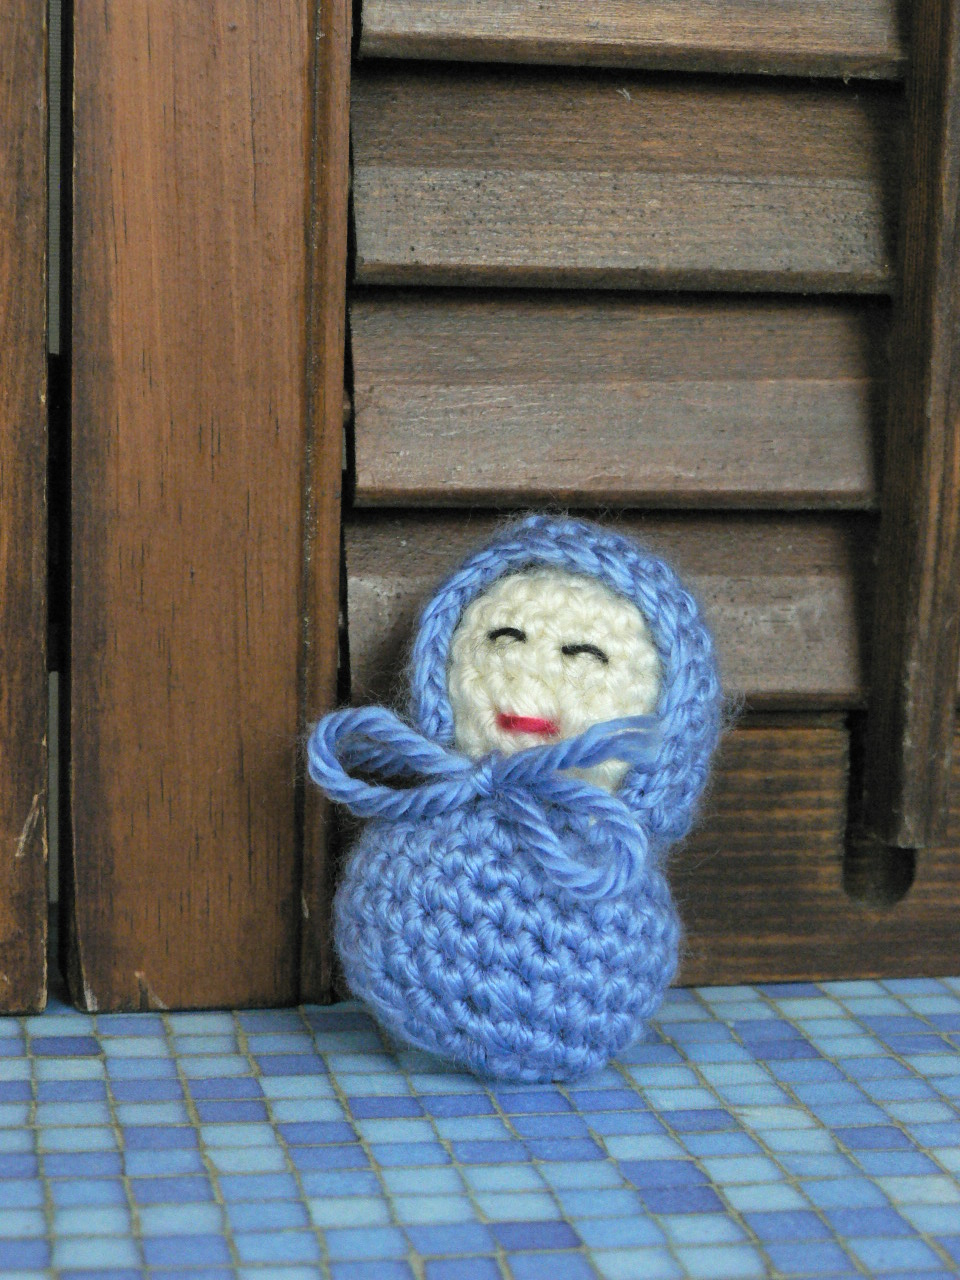 2000 Free Amigurumi Patterns: Bitty Baby Amigurumi – designed by ...